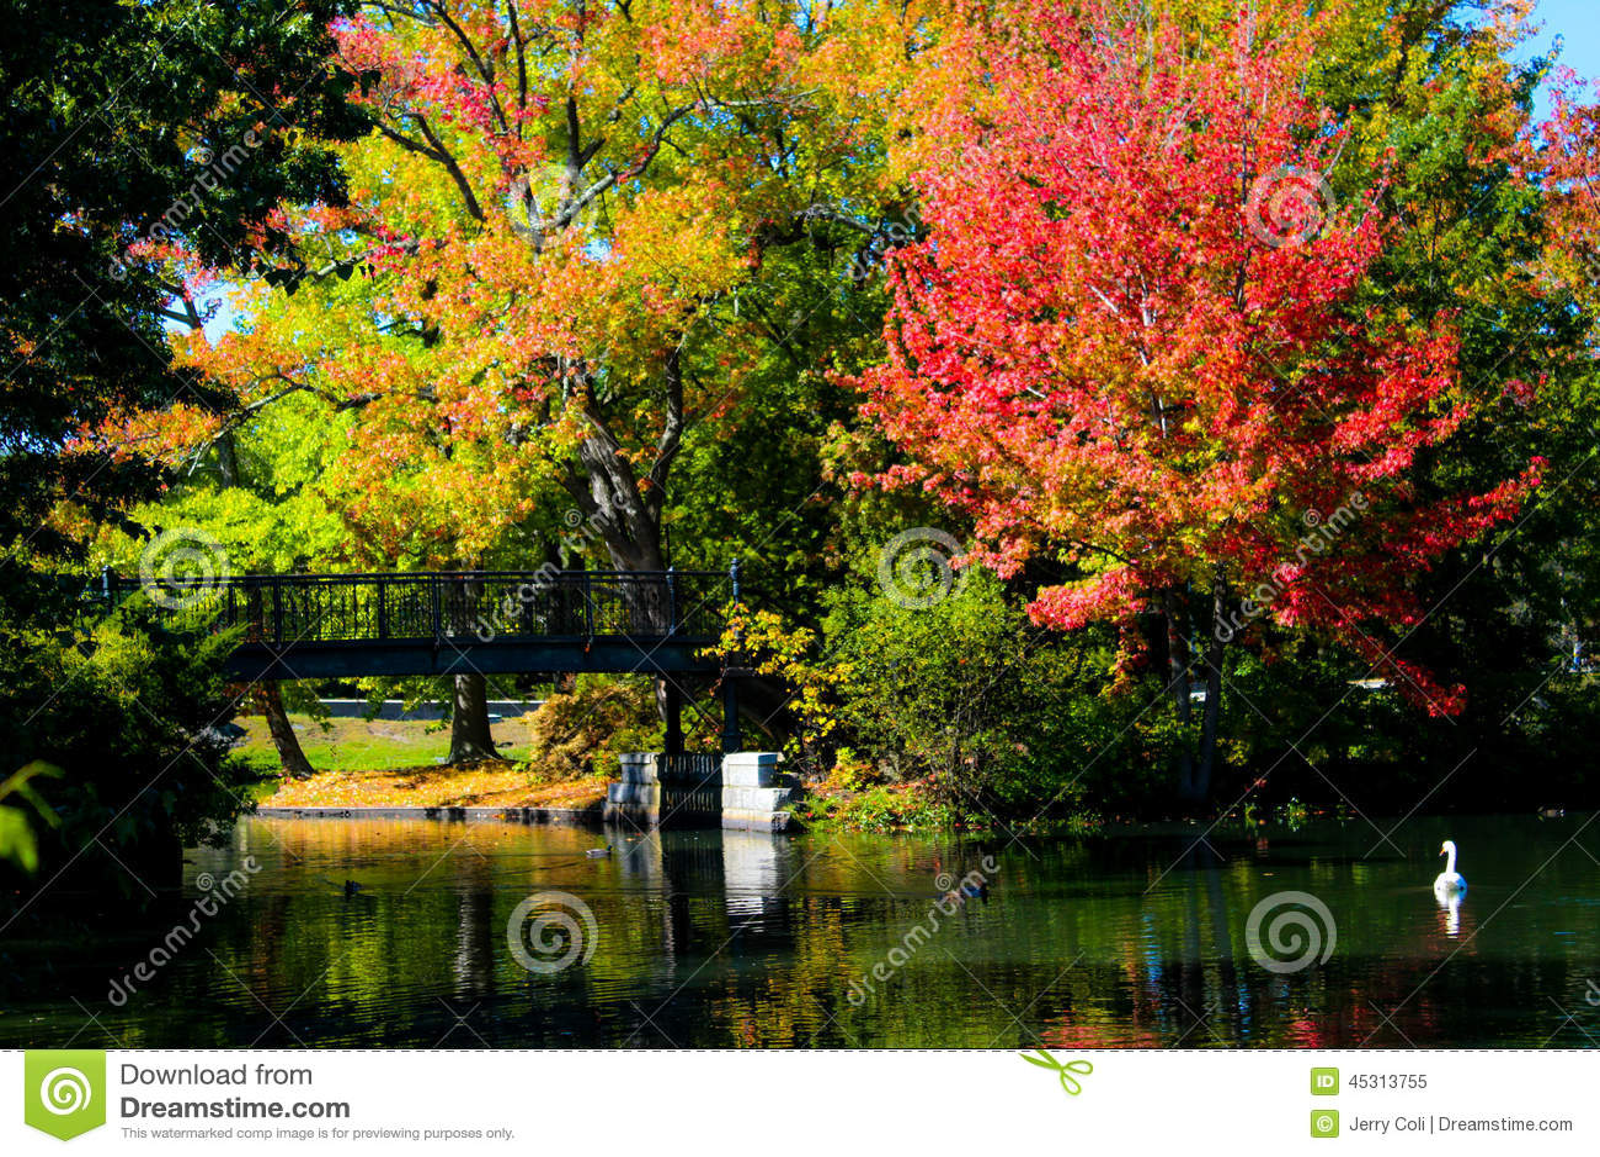 autumn leaves roger williams pdf